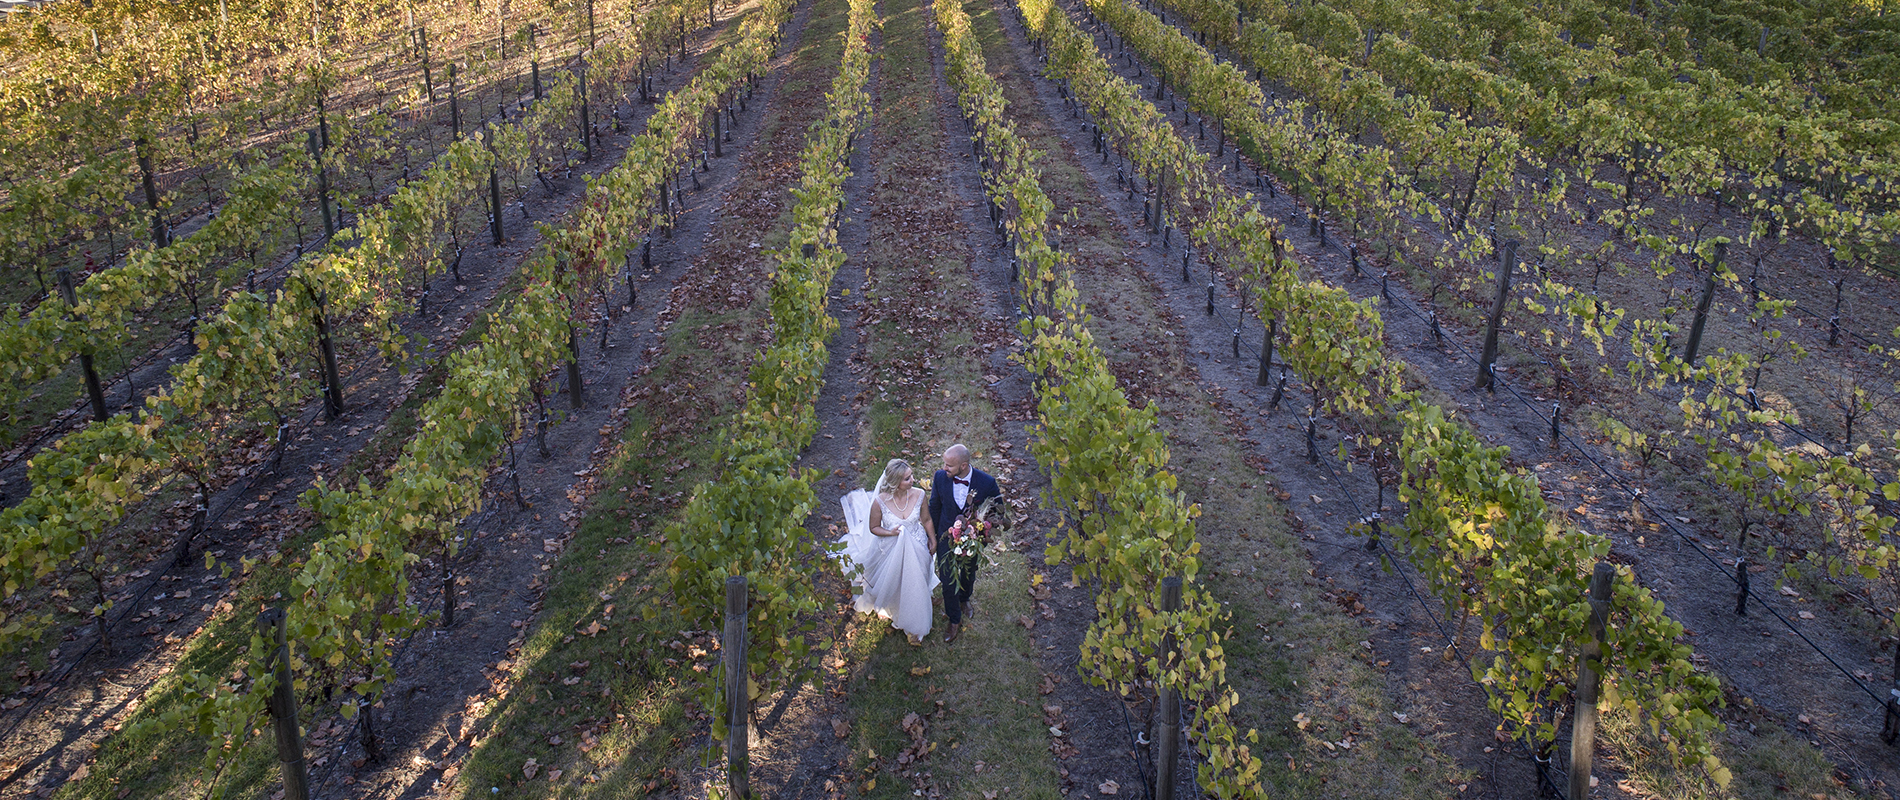 Best wedding photographer Adelaide - Belle Photo